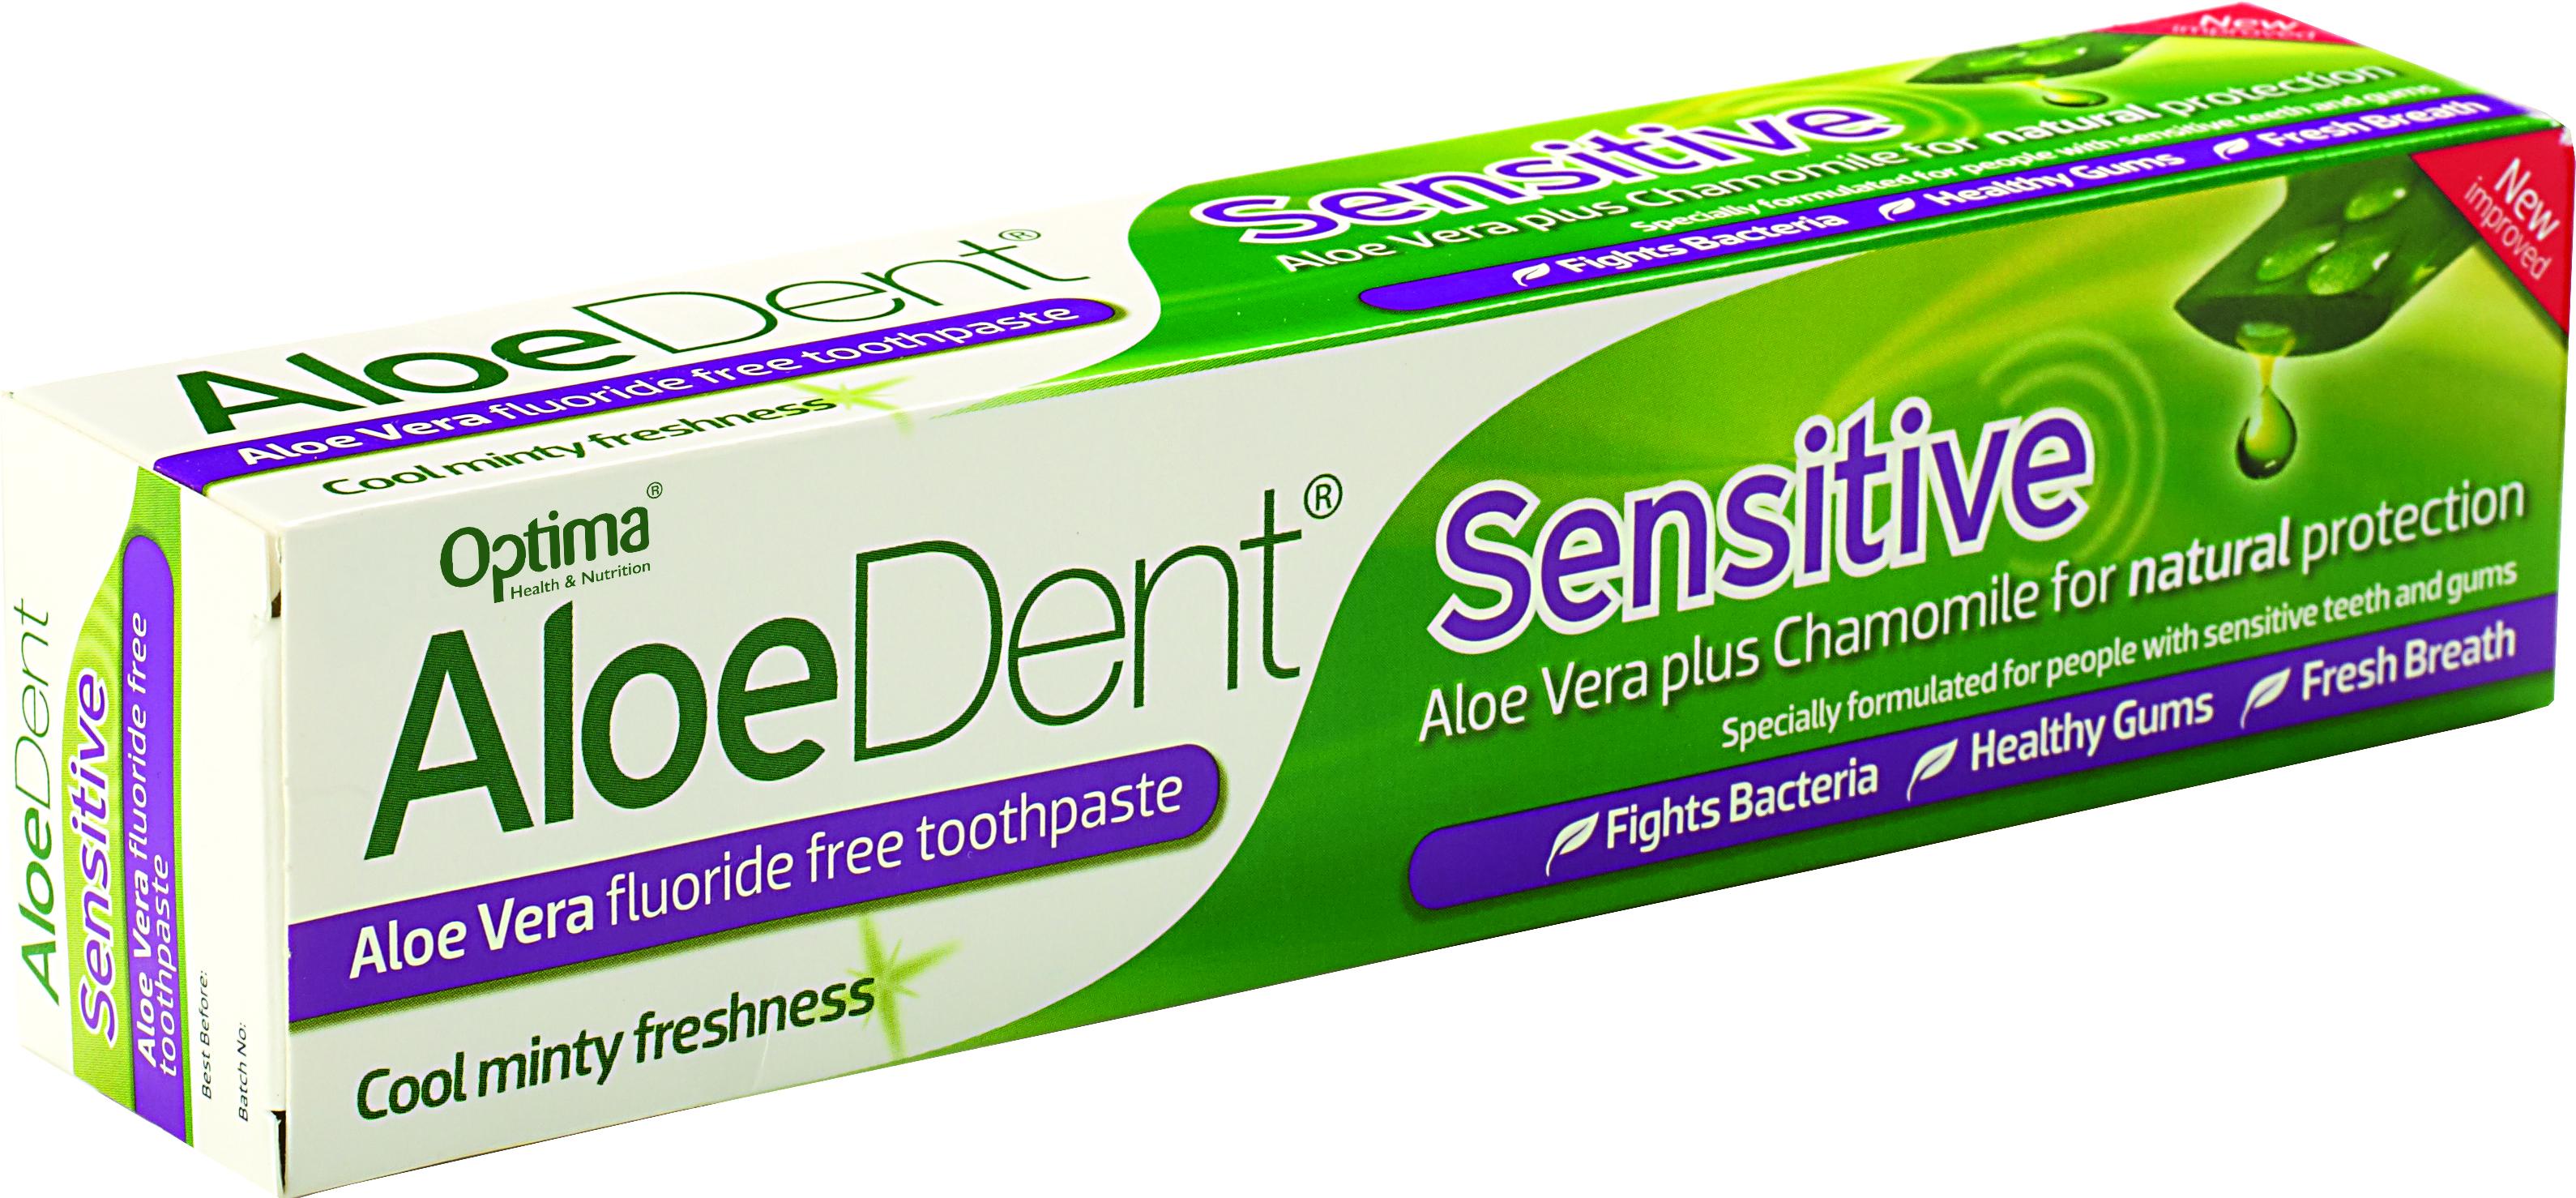 Optima Aloe Dent Sensitive Toothpaste, 100ml υγιεινή   στοματική υγιεινή   οδοντόκρεμες για ολοκληρωμένη προστασία